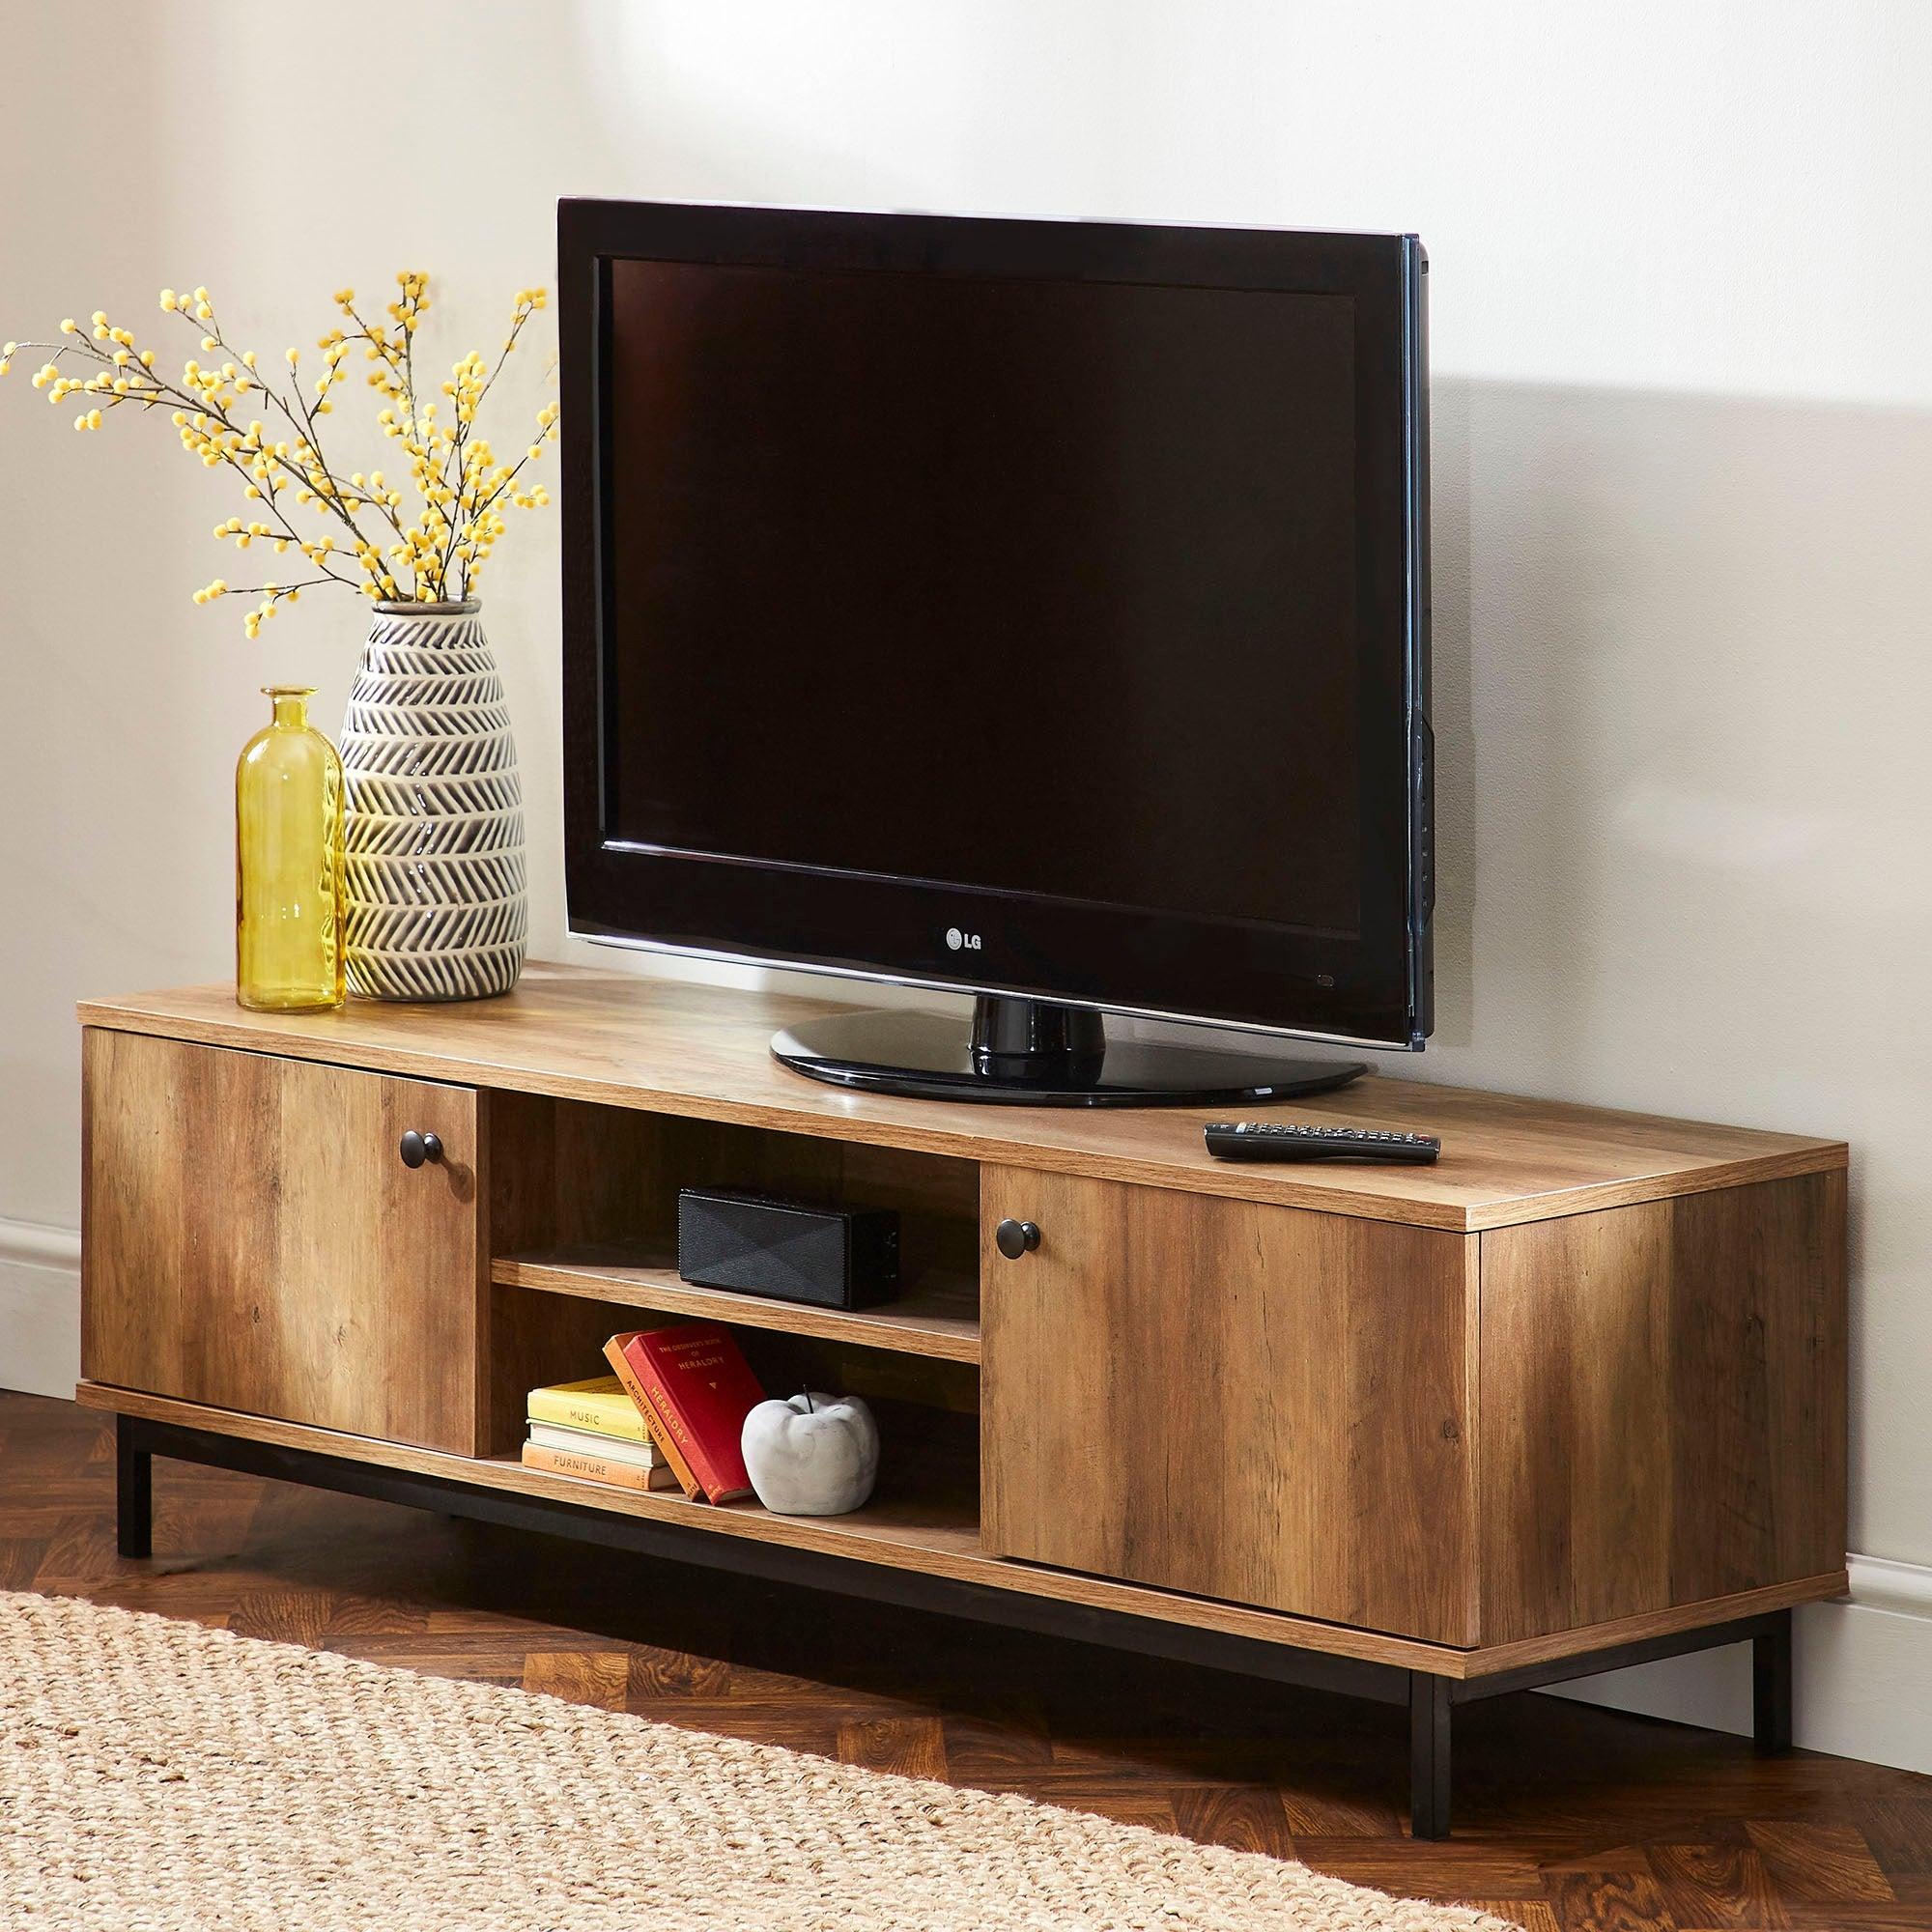 Dunelm Fulton Wide TV Stand Pine |